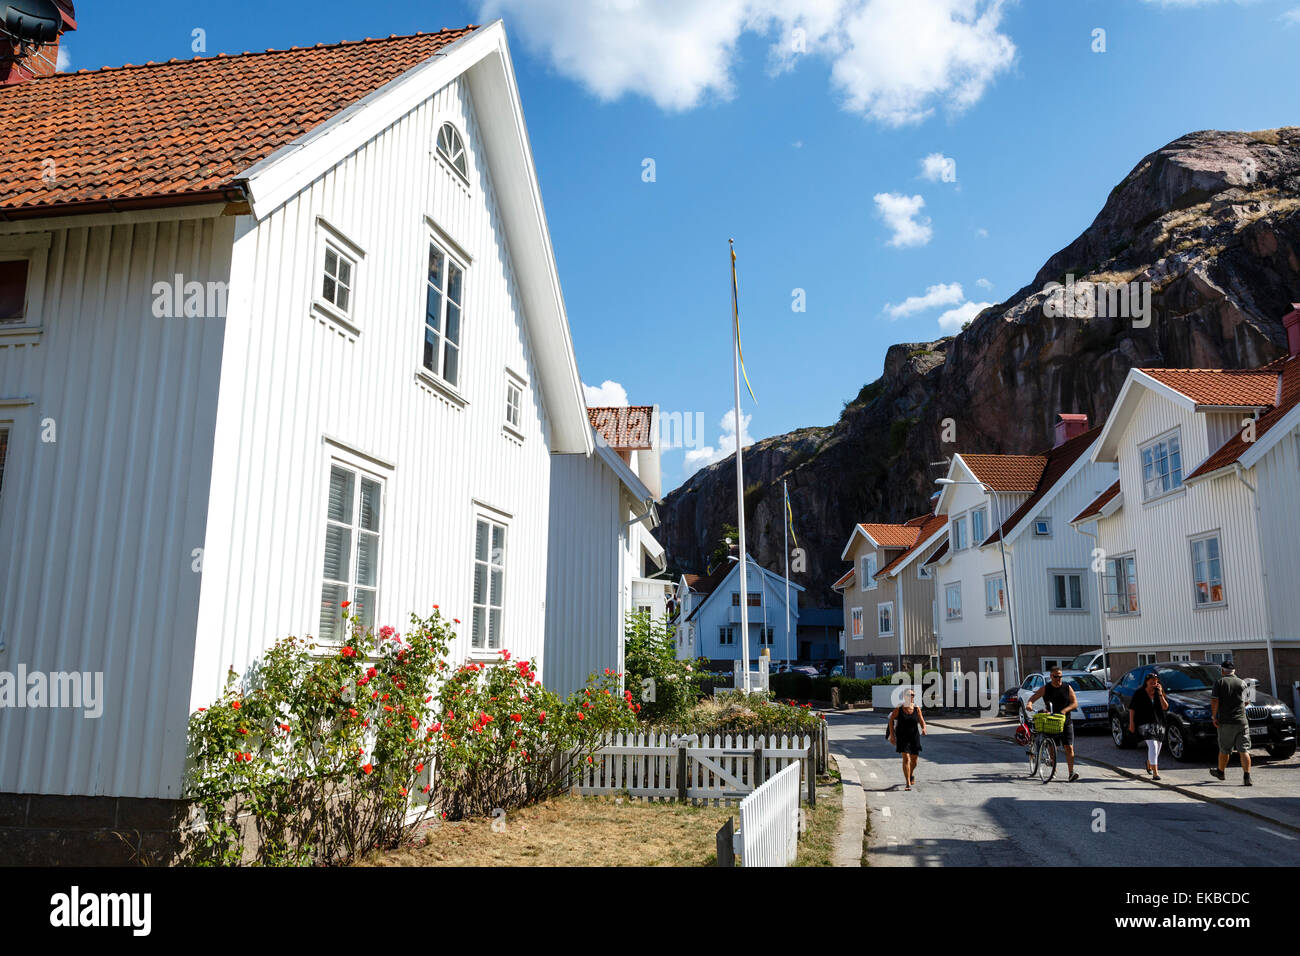 Casas en Bohuslan Fjallbacka, región, costa oeste, Suecia, Escandinavia, Europa Foto de stock